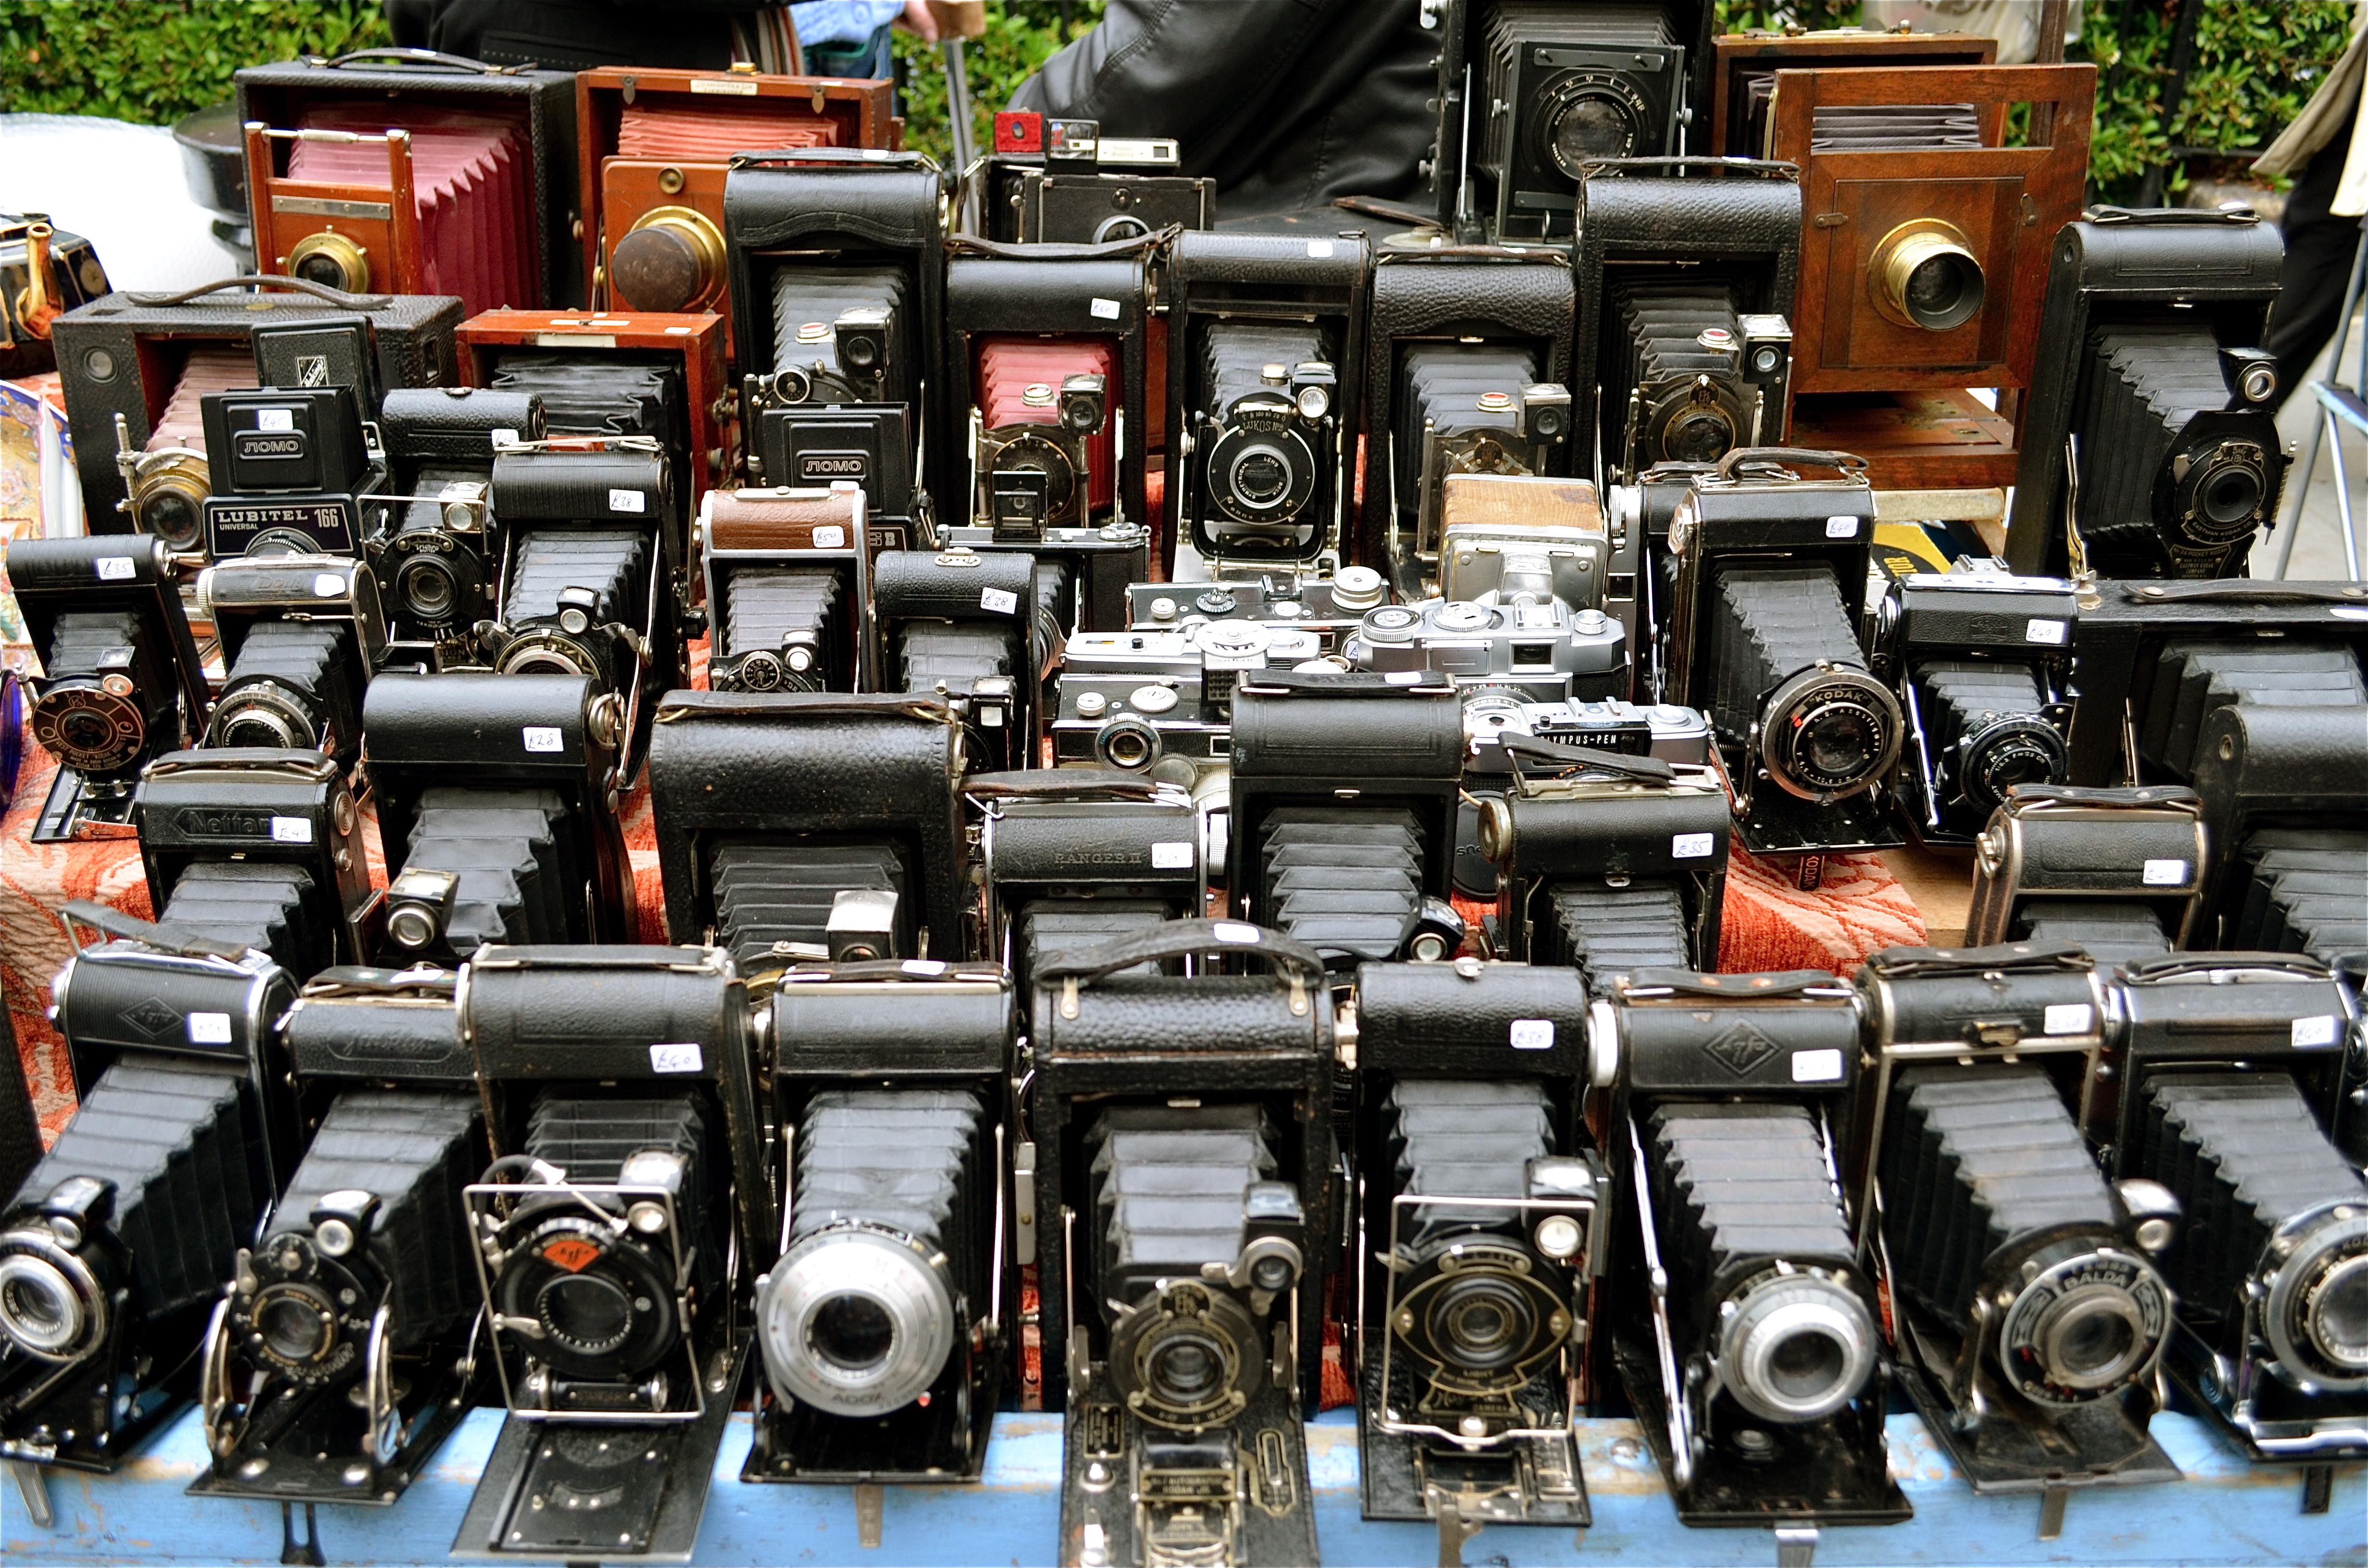 Street markets in london portobello road amp camden lock